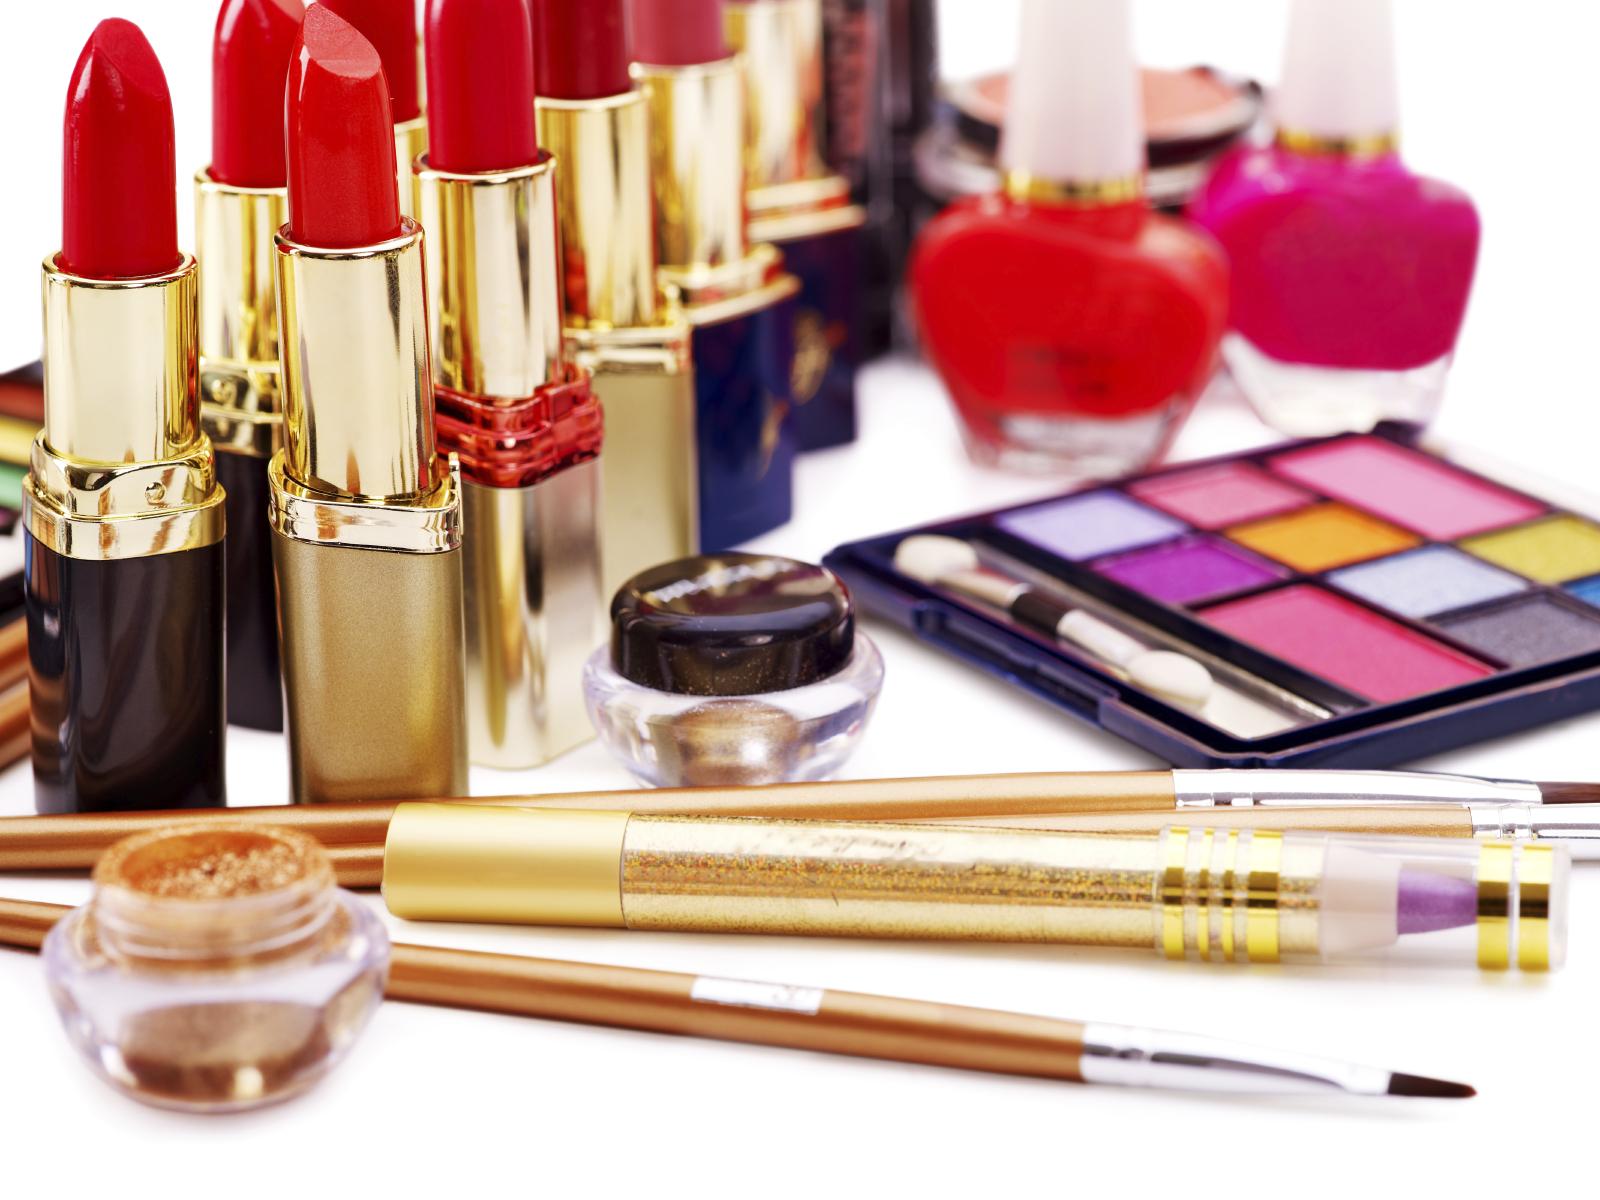 halal makeup the latest in natural cosmetics brandsynario